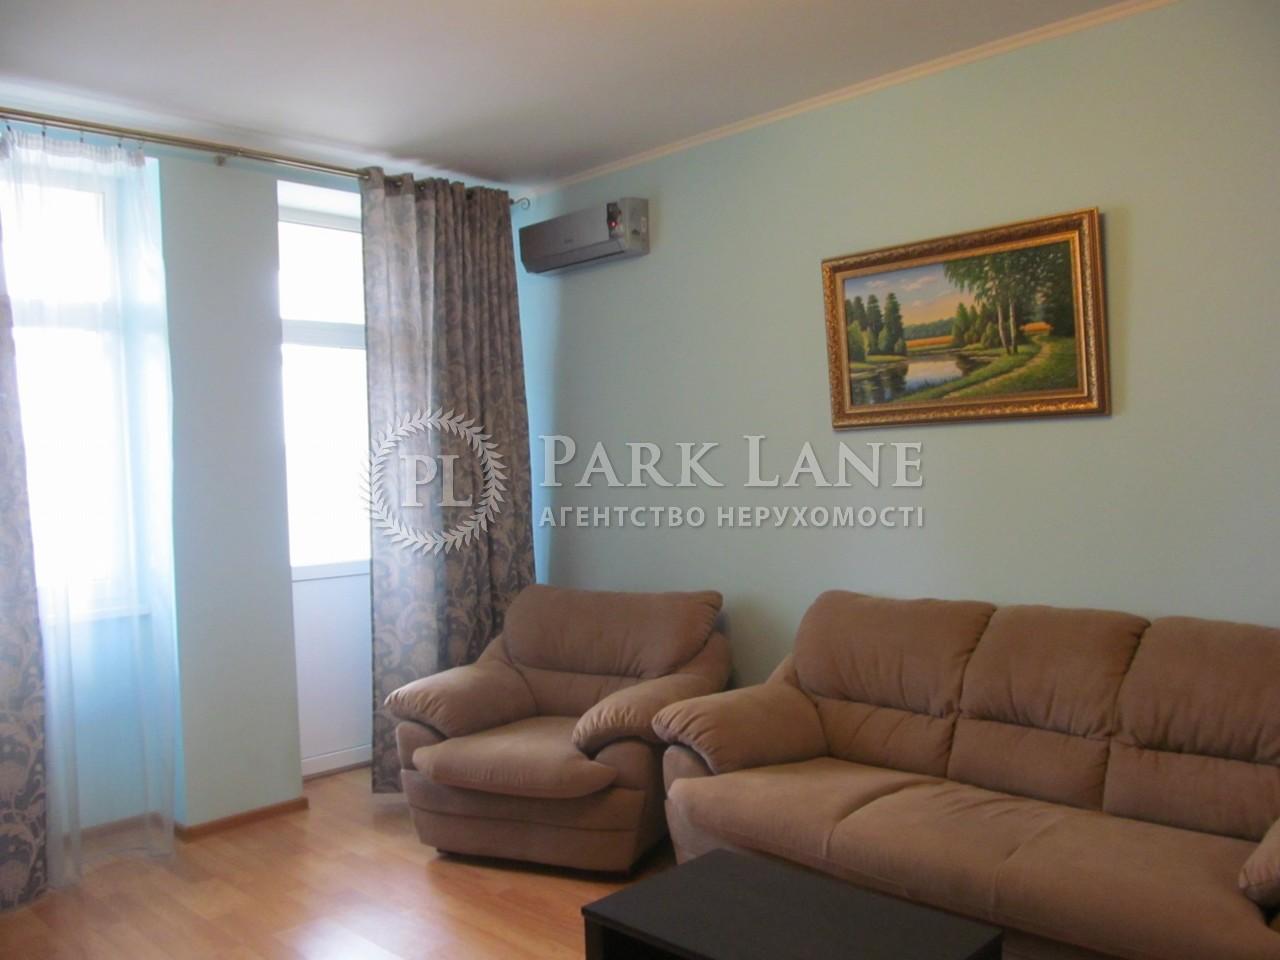 Квартира вул. Жилянська, 118, Київ, R-13819 - Фото 3